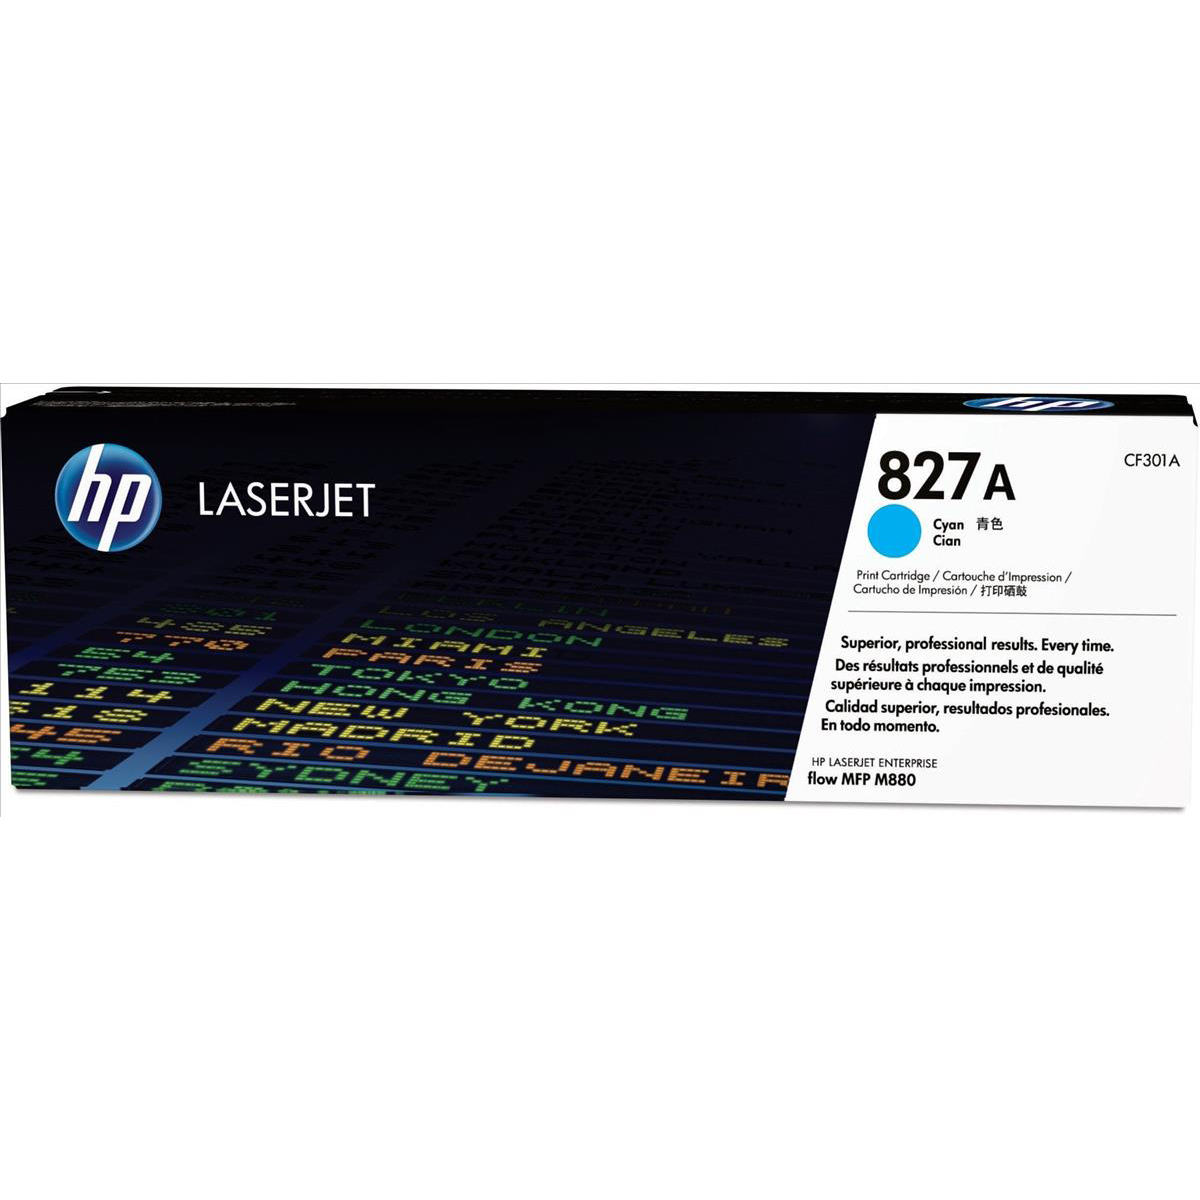 HP 827A LaserJet Toner Cartridge Page Life 32000pp Cyan Ref CF301A